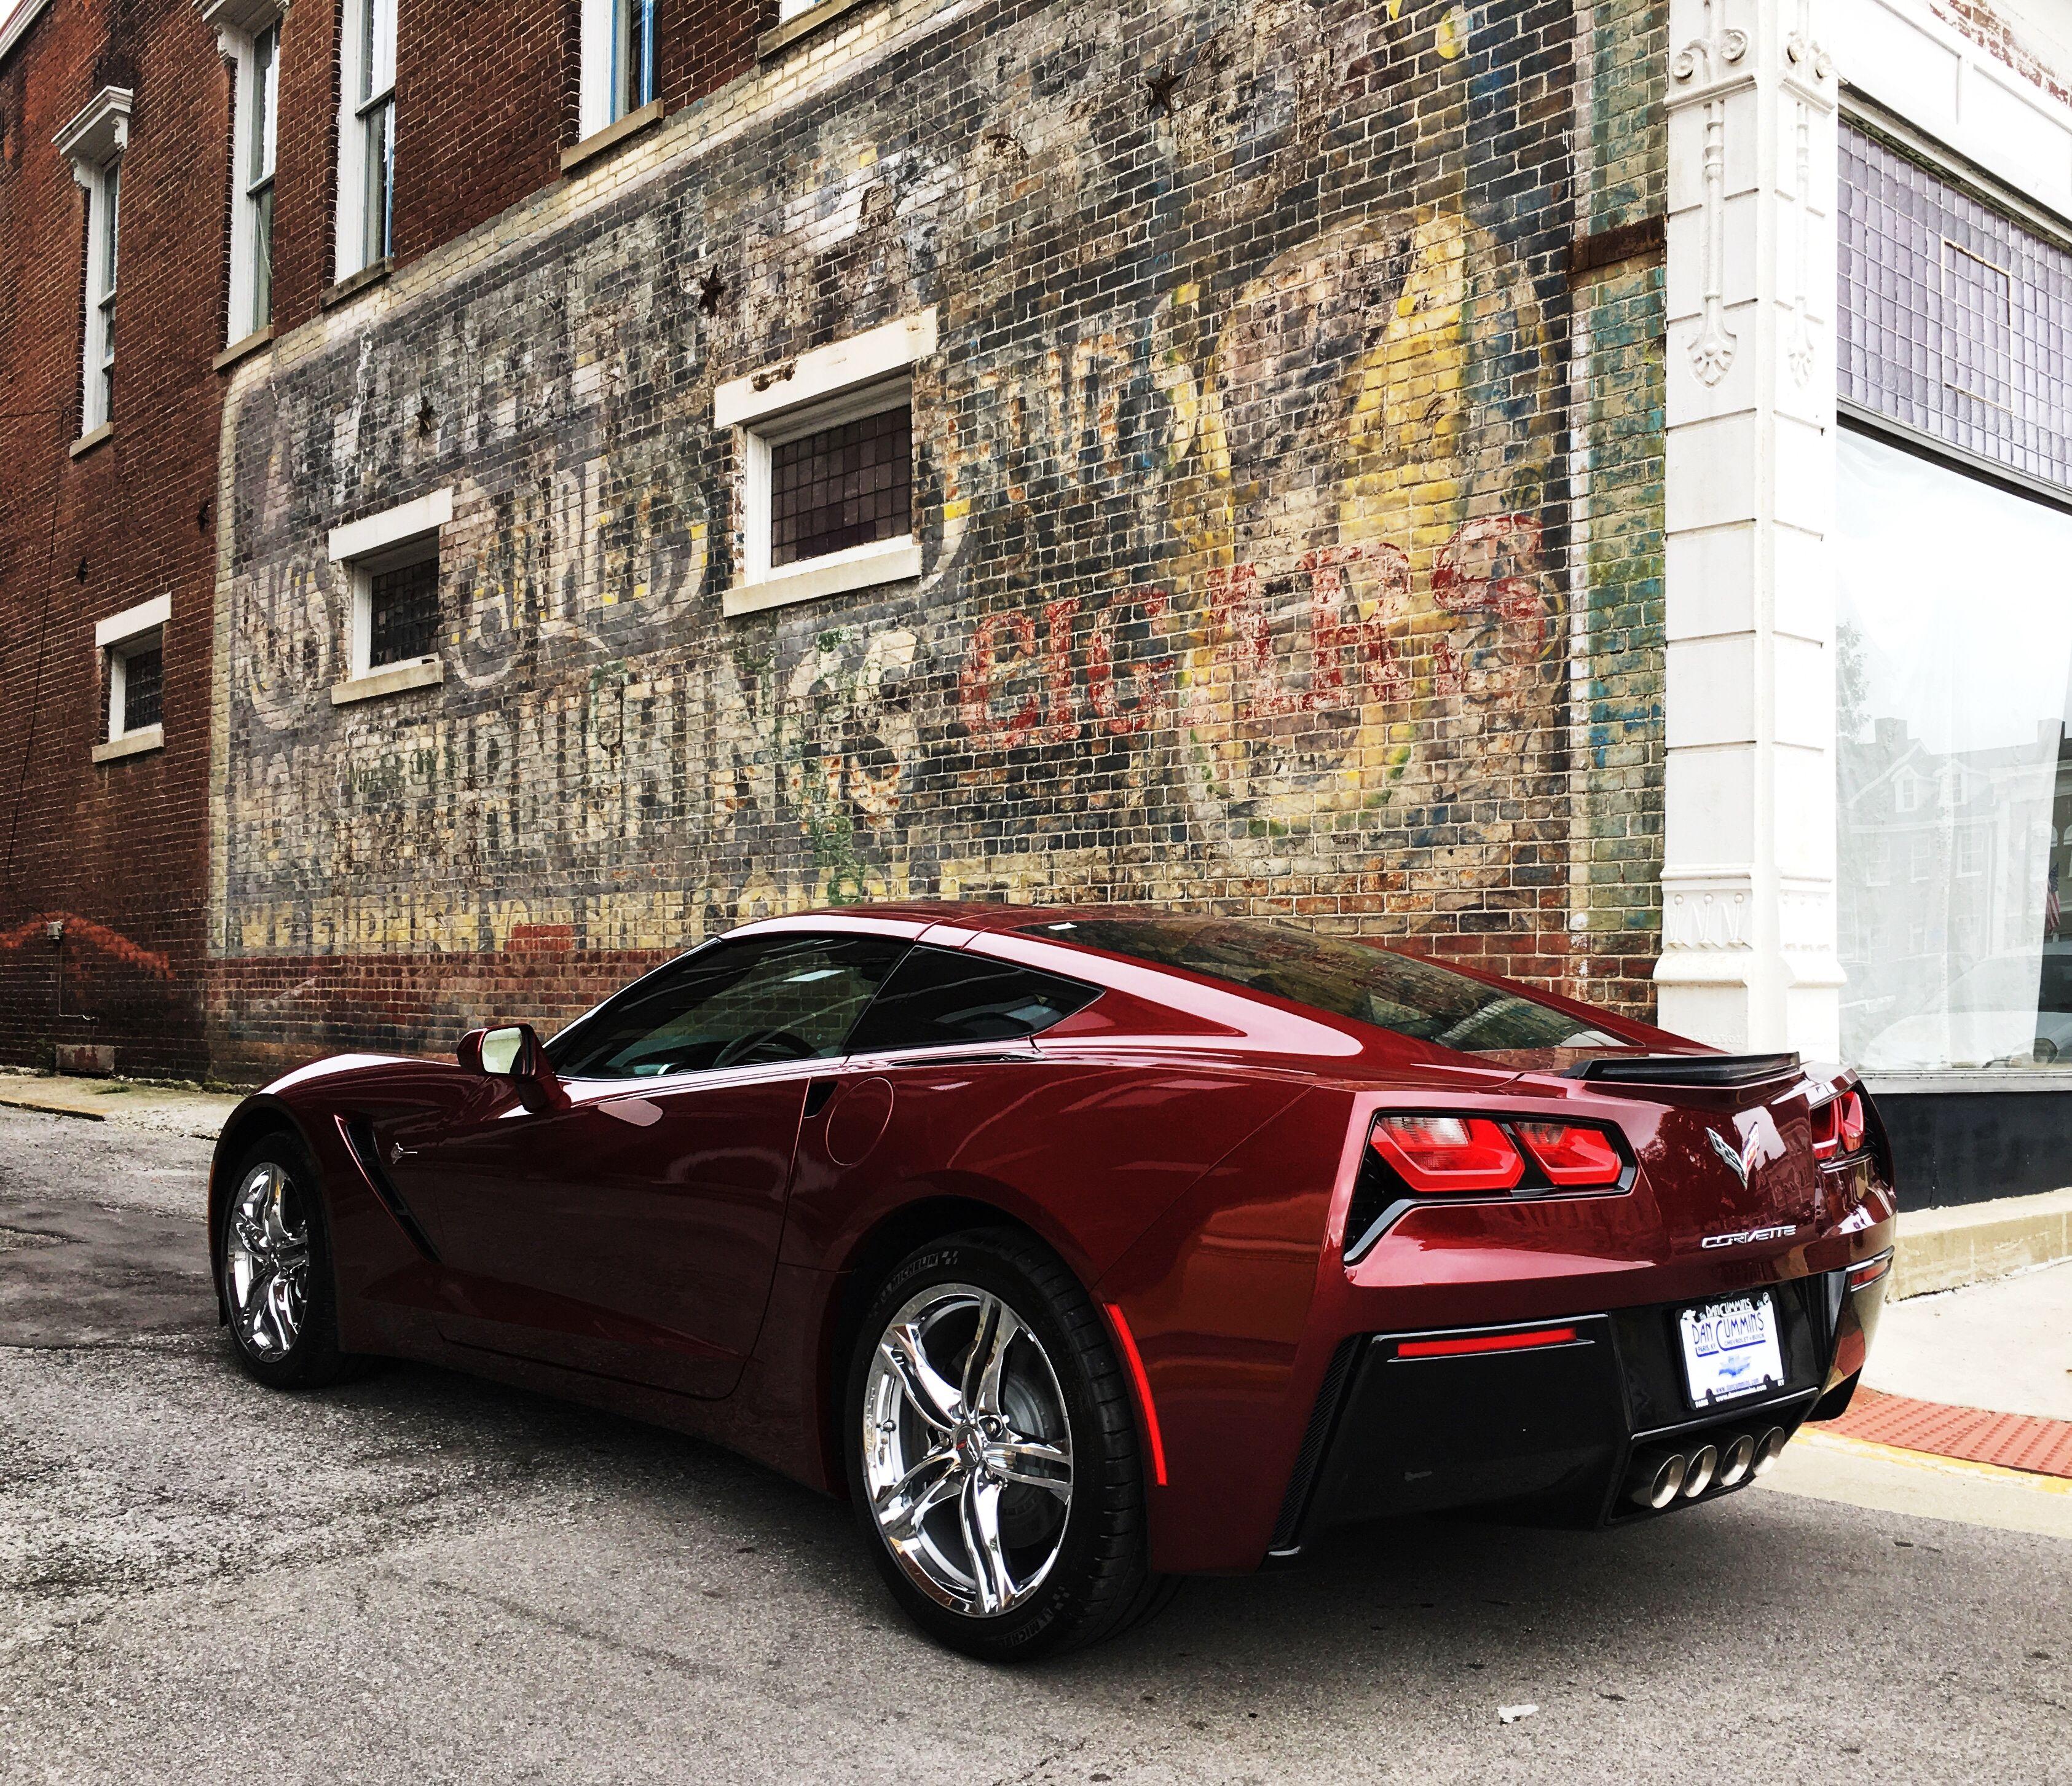 2017 Corvette Stingray In Long Beach Red Metallic Tintcoat